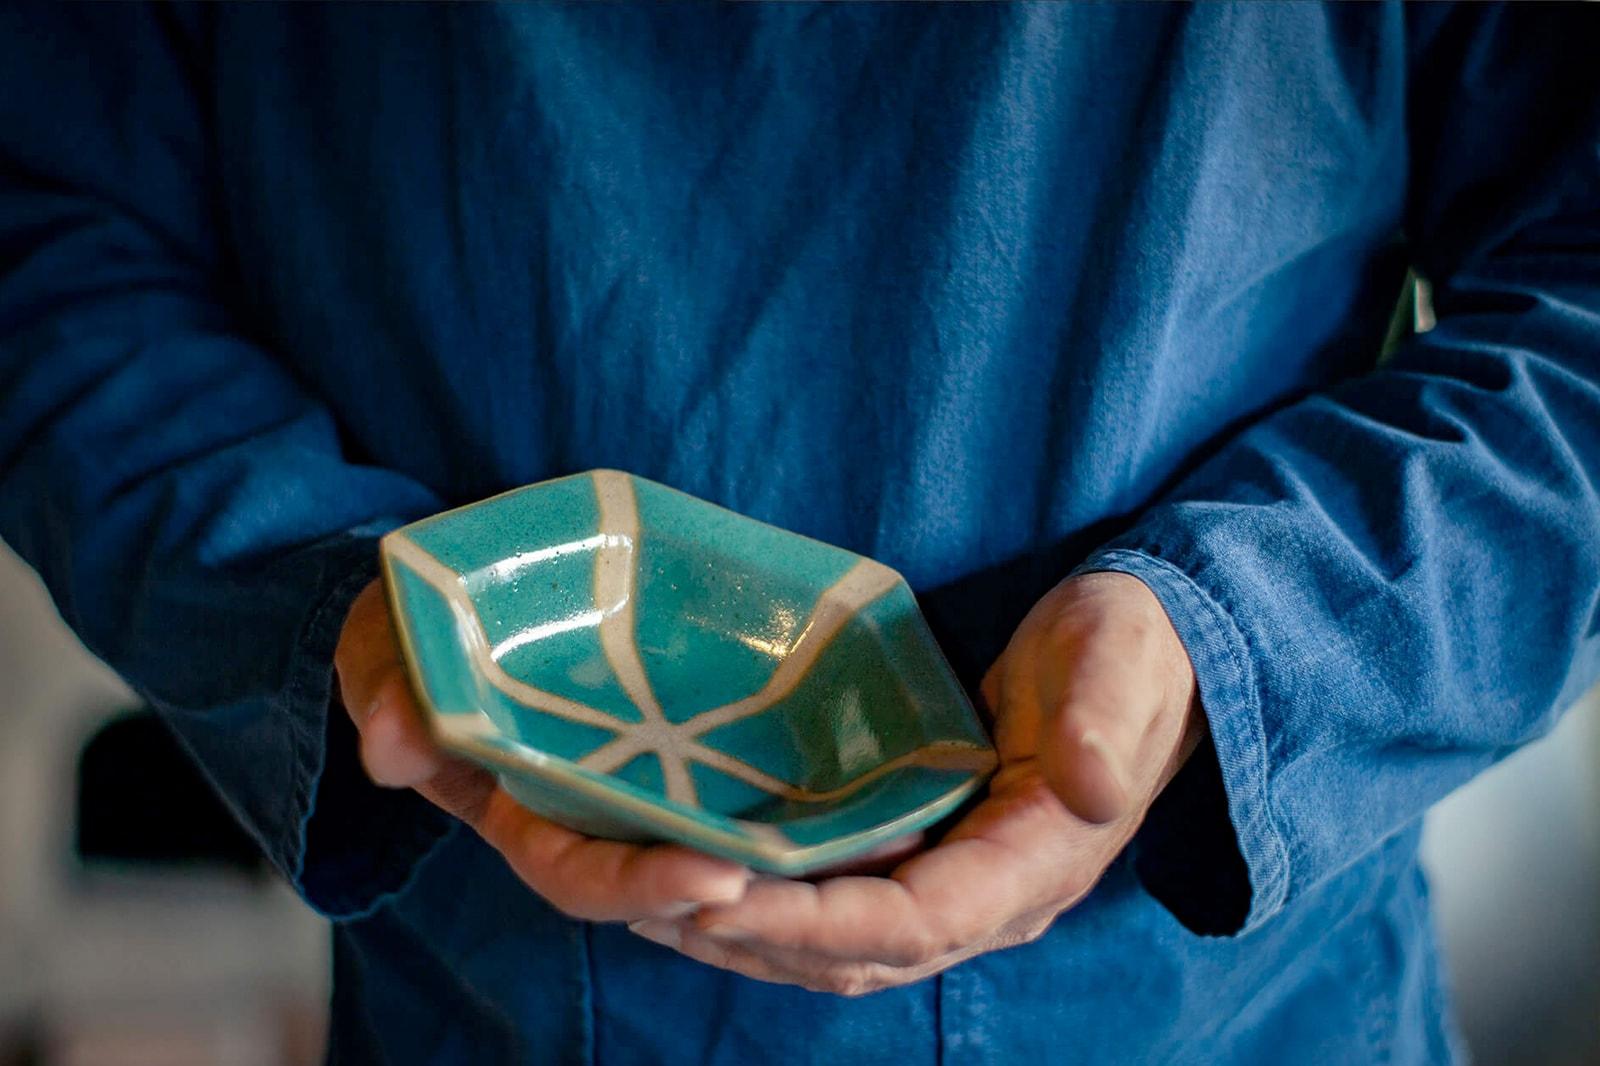 BEAMS JAPAN 是如何將日本傳統文化「流行化」?  創意人觀點